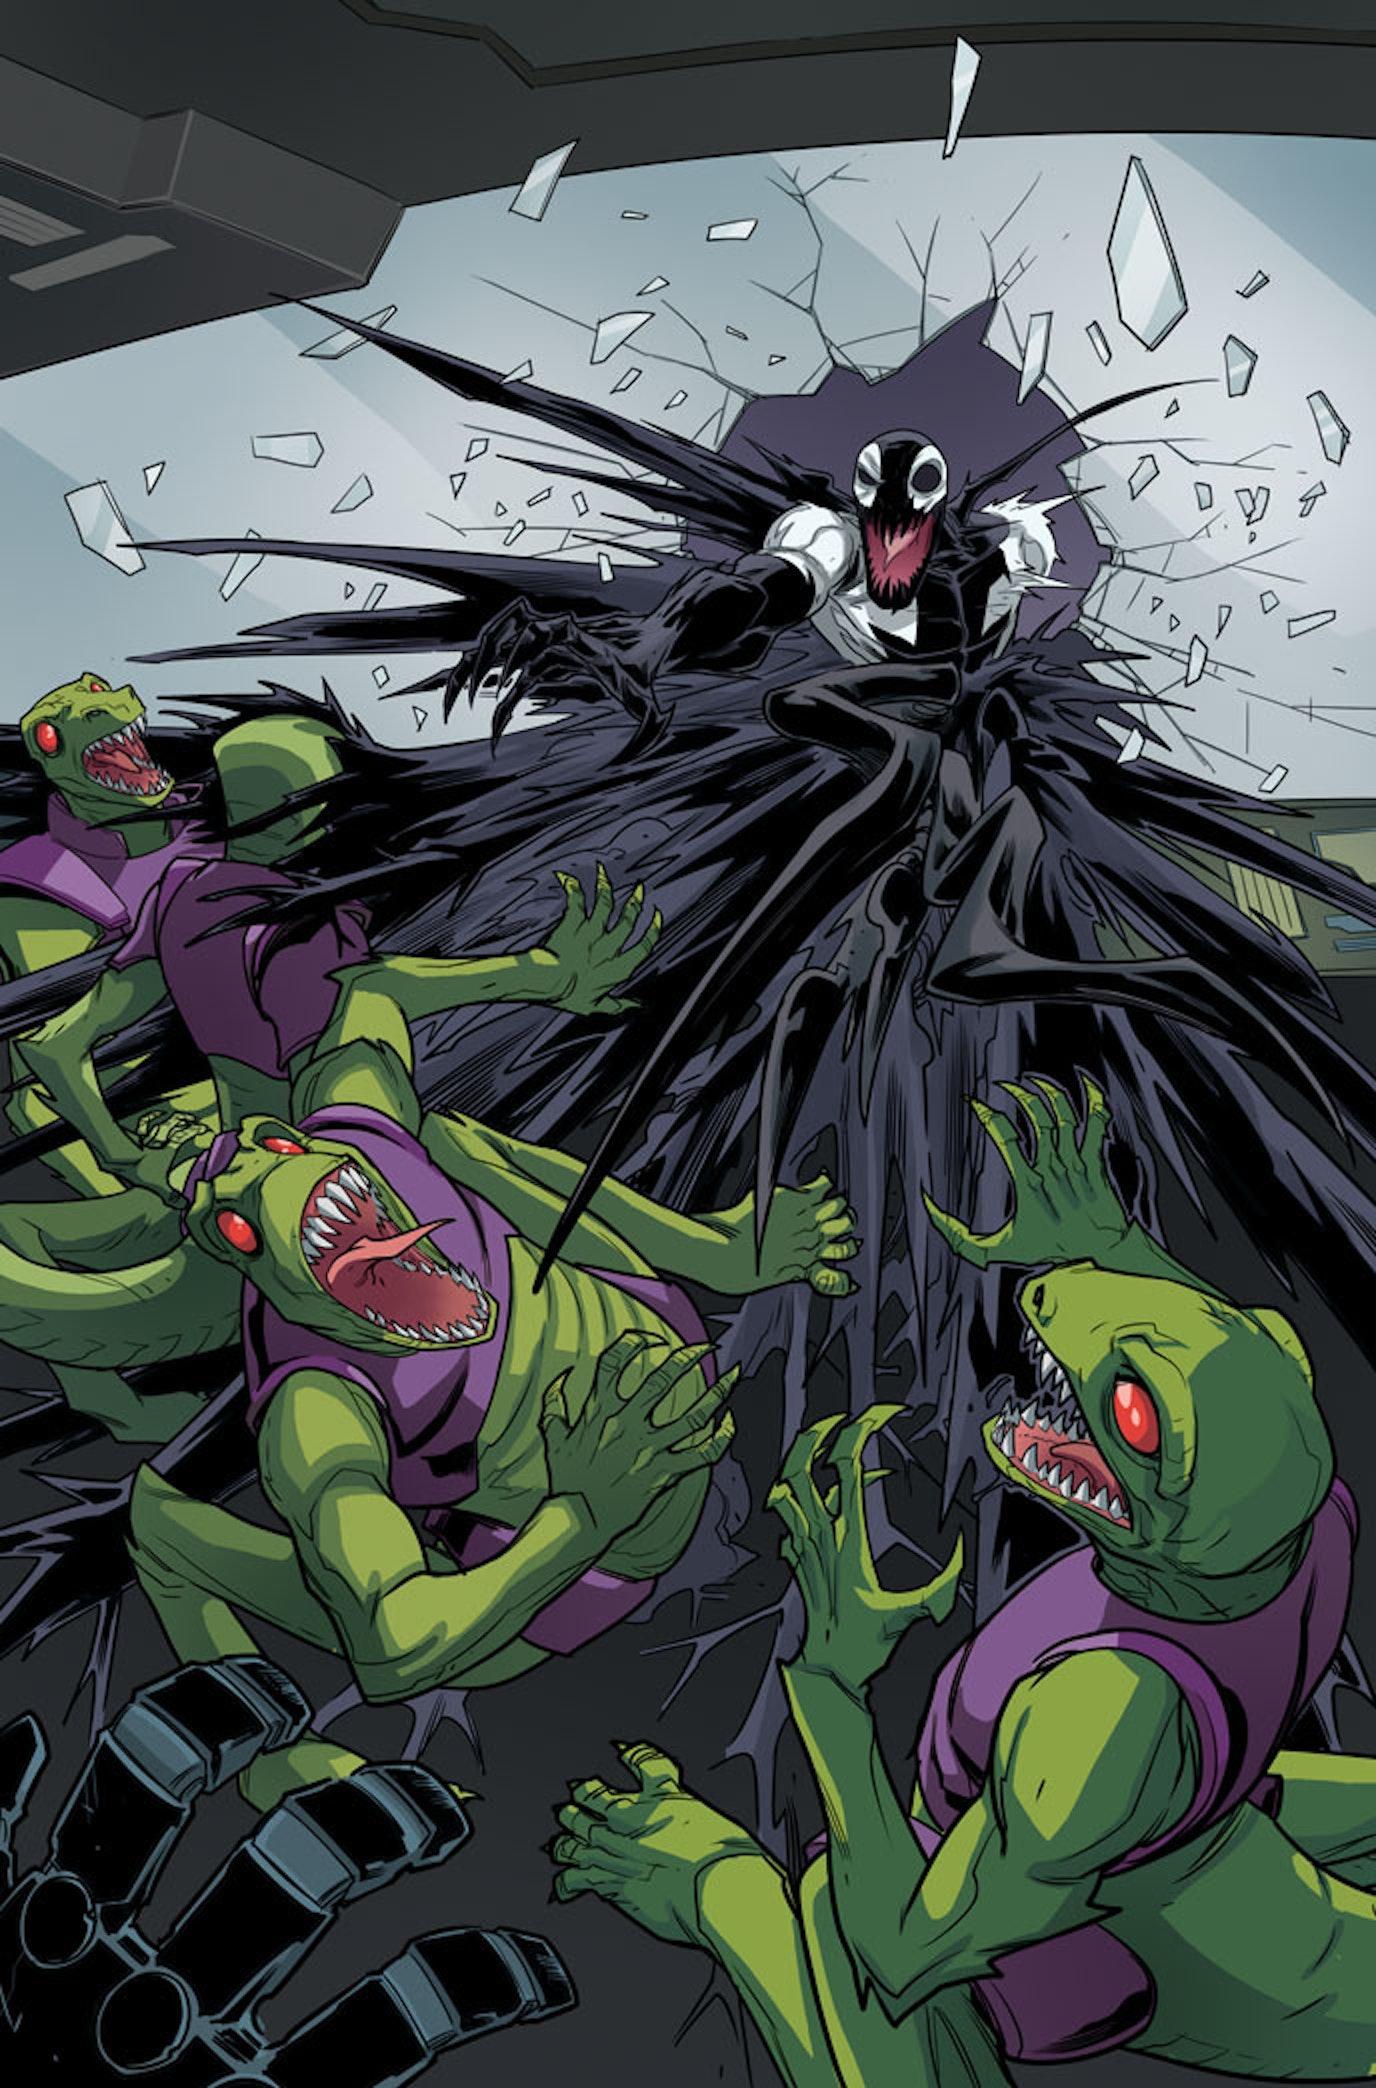 Preview for Marvel Comics Deadpool: Back in Black